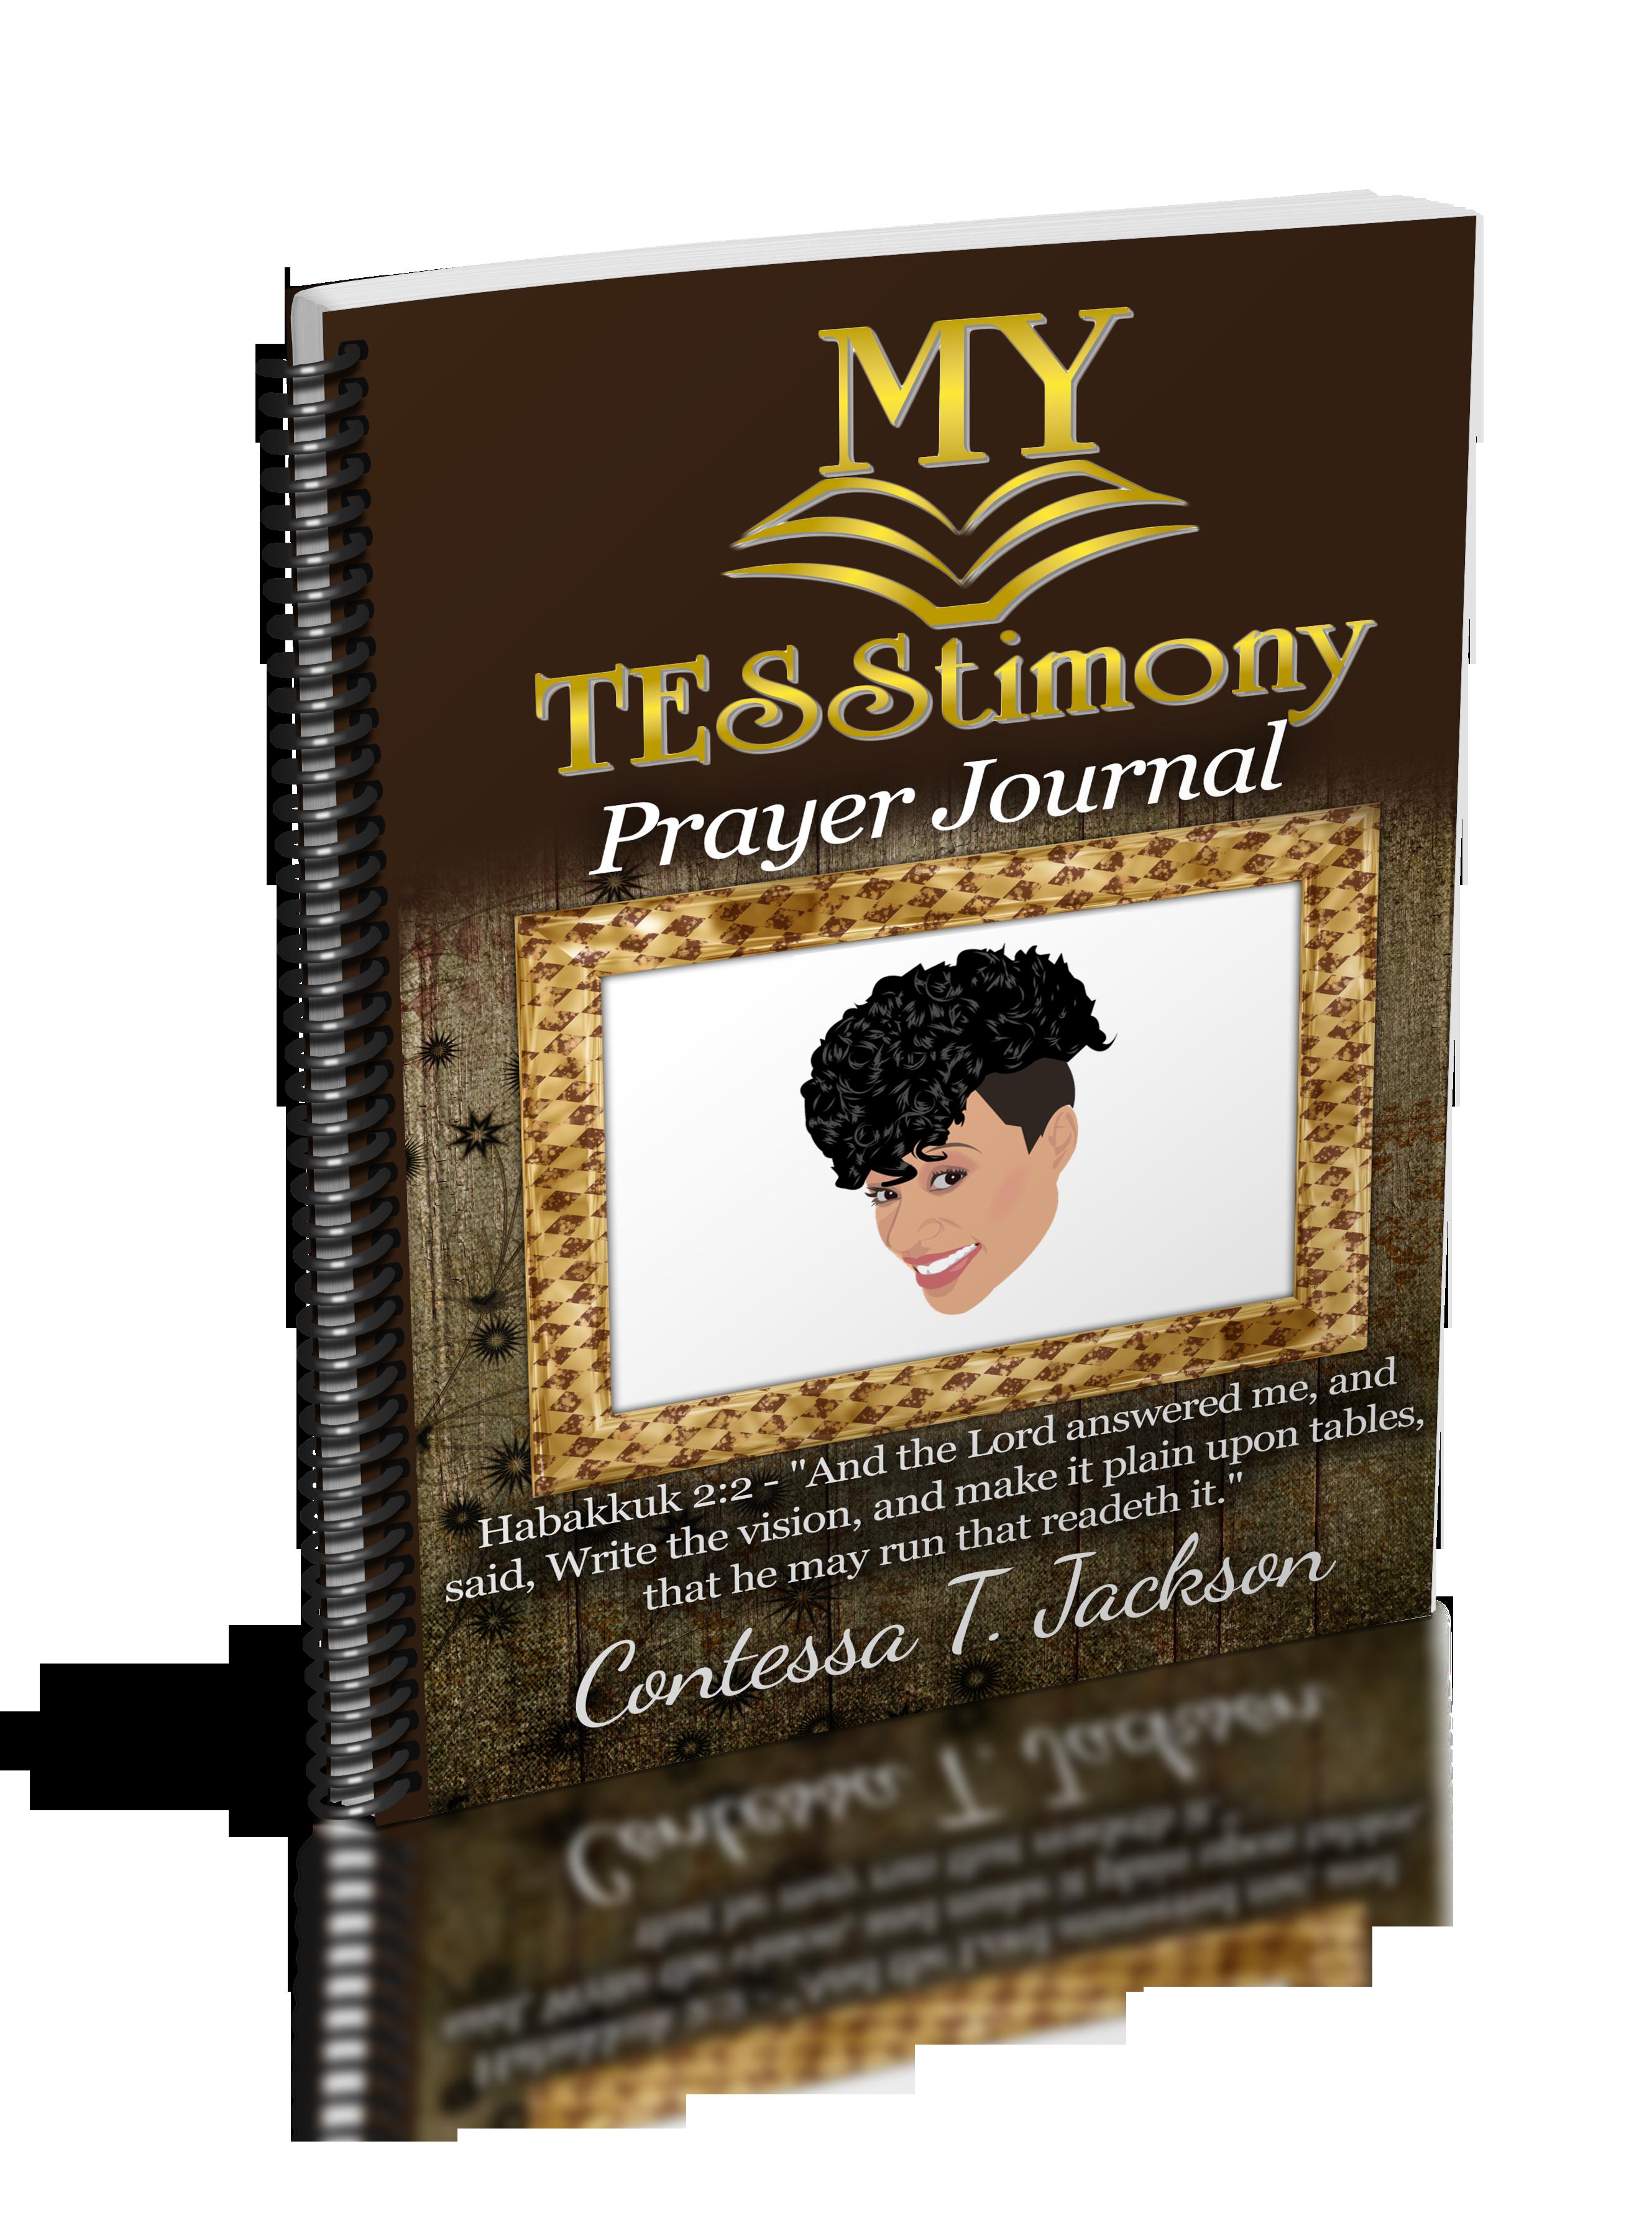 My TESStimony Prayer and Daily Journal 00005